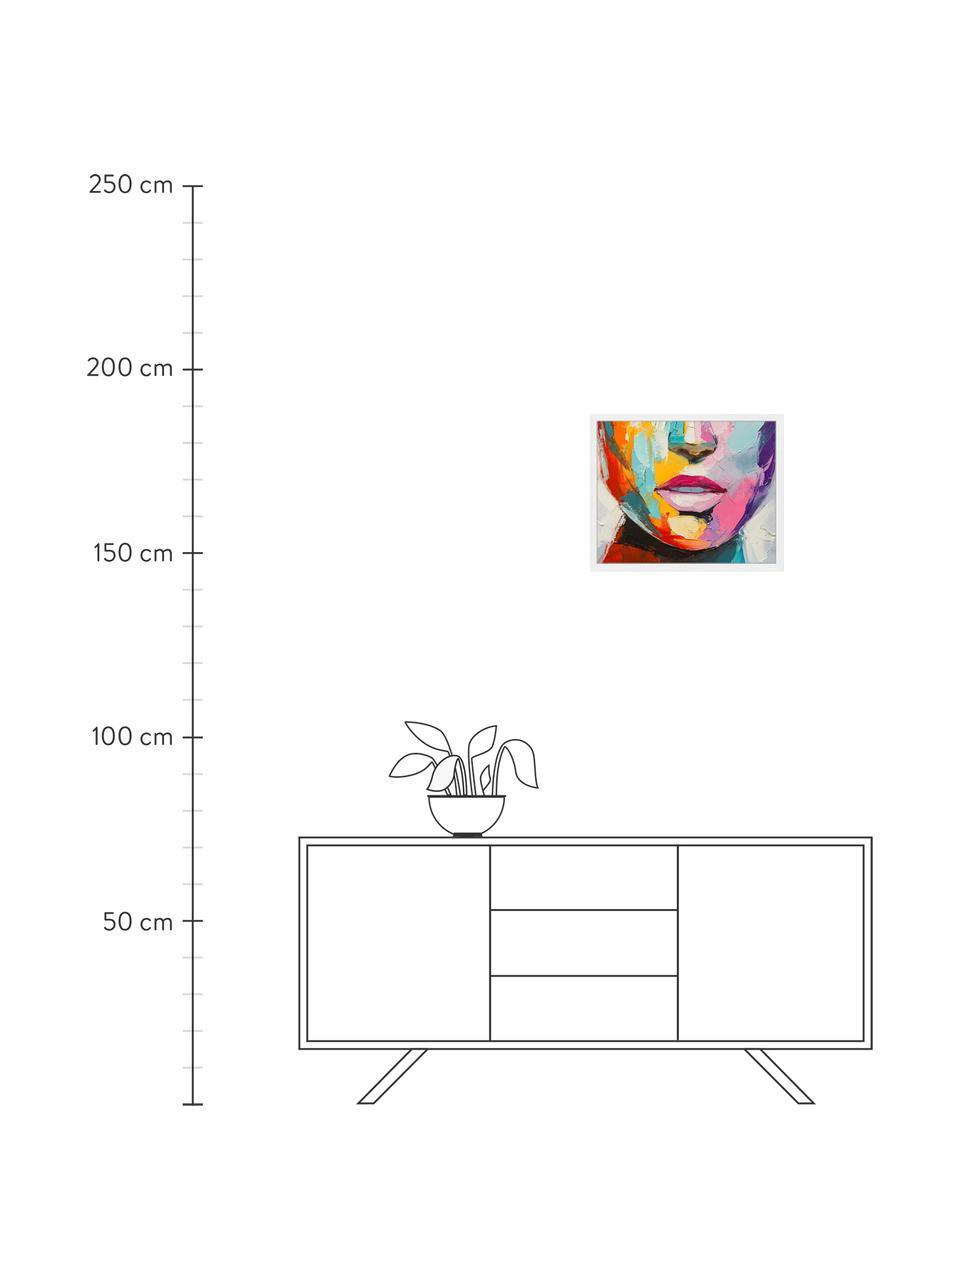 Gerahmter Digitaldruck Colorful Emotions, Bild: Digitaldruck auf Papier, , Rahmen: Holz, lackiert, Front: Plexiglas, Mehrfarbig, 63 x 53 cm